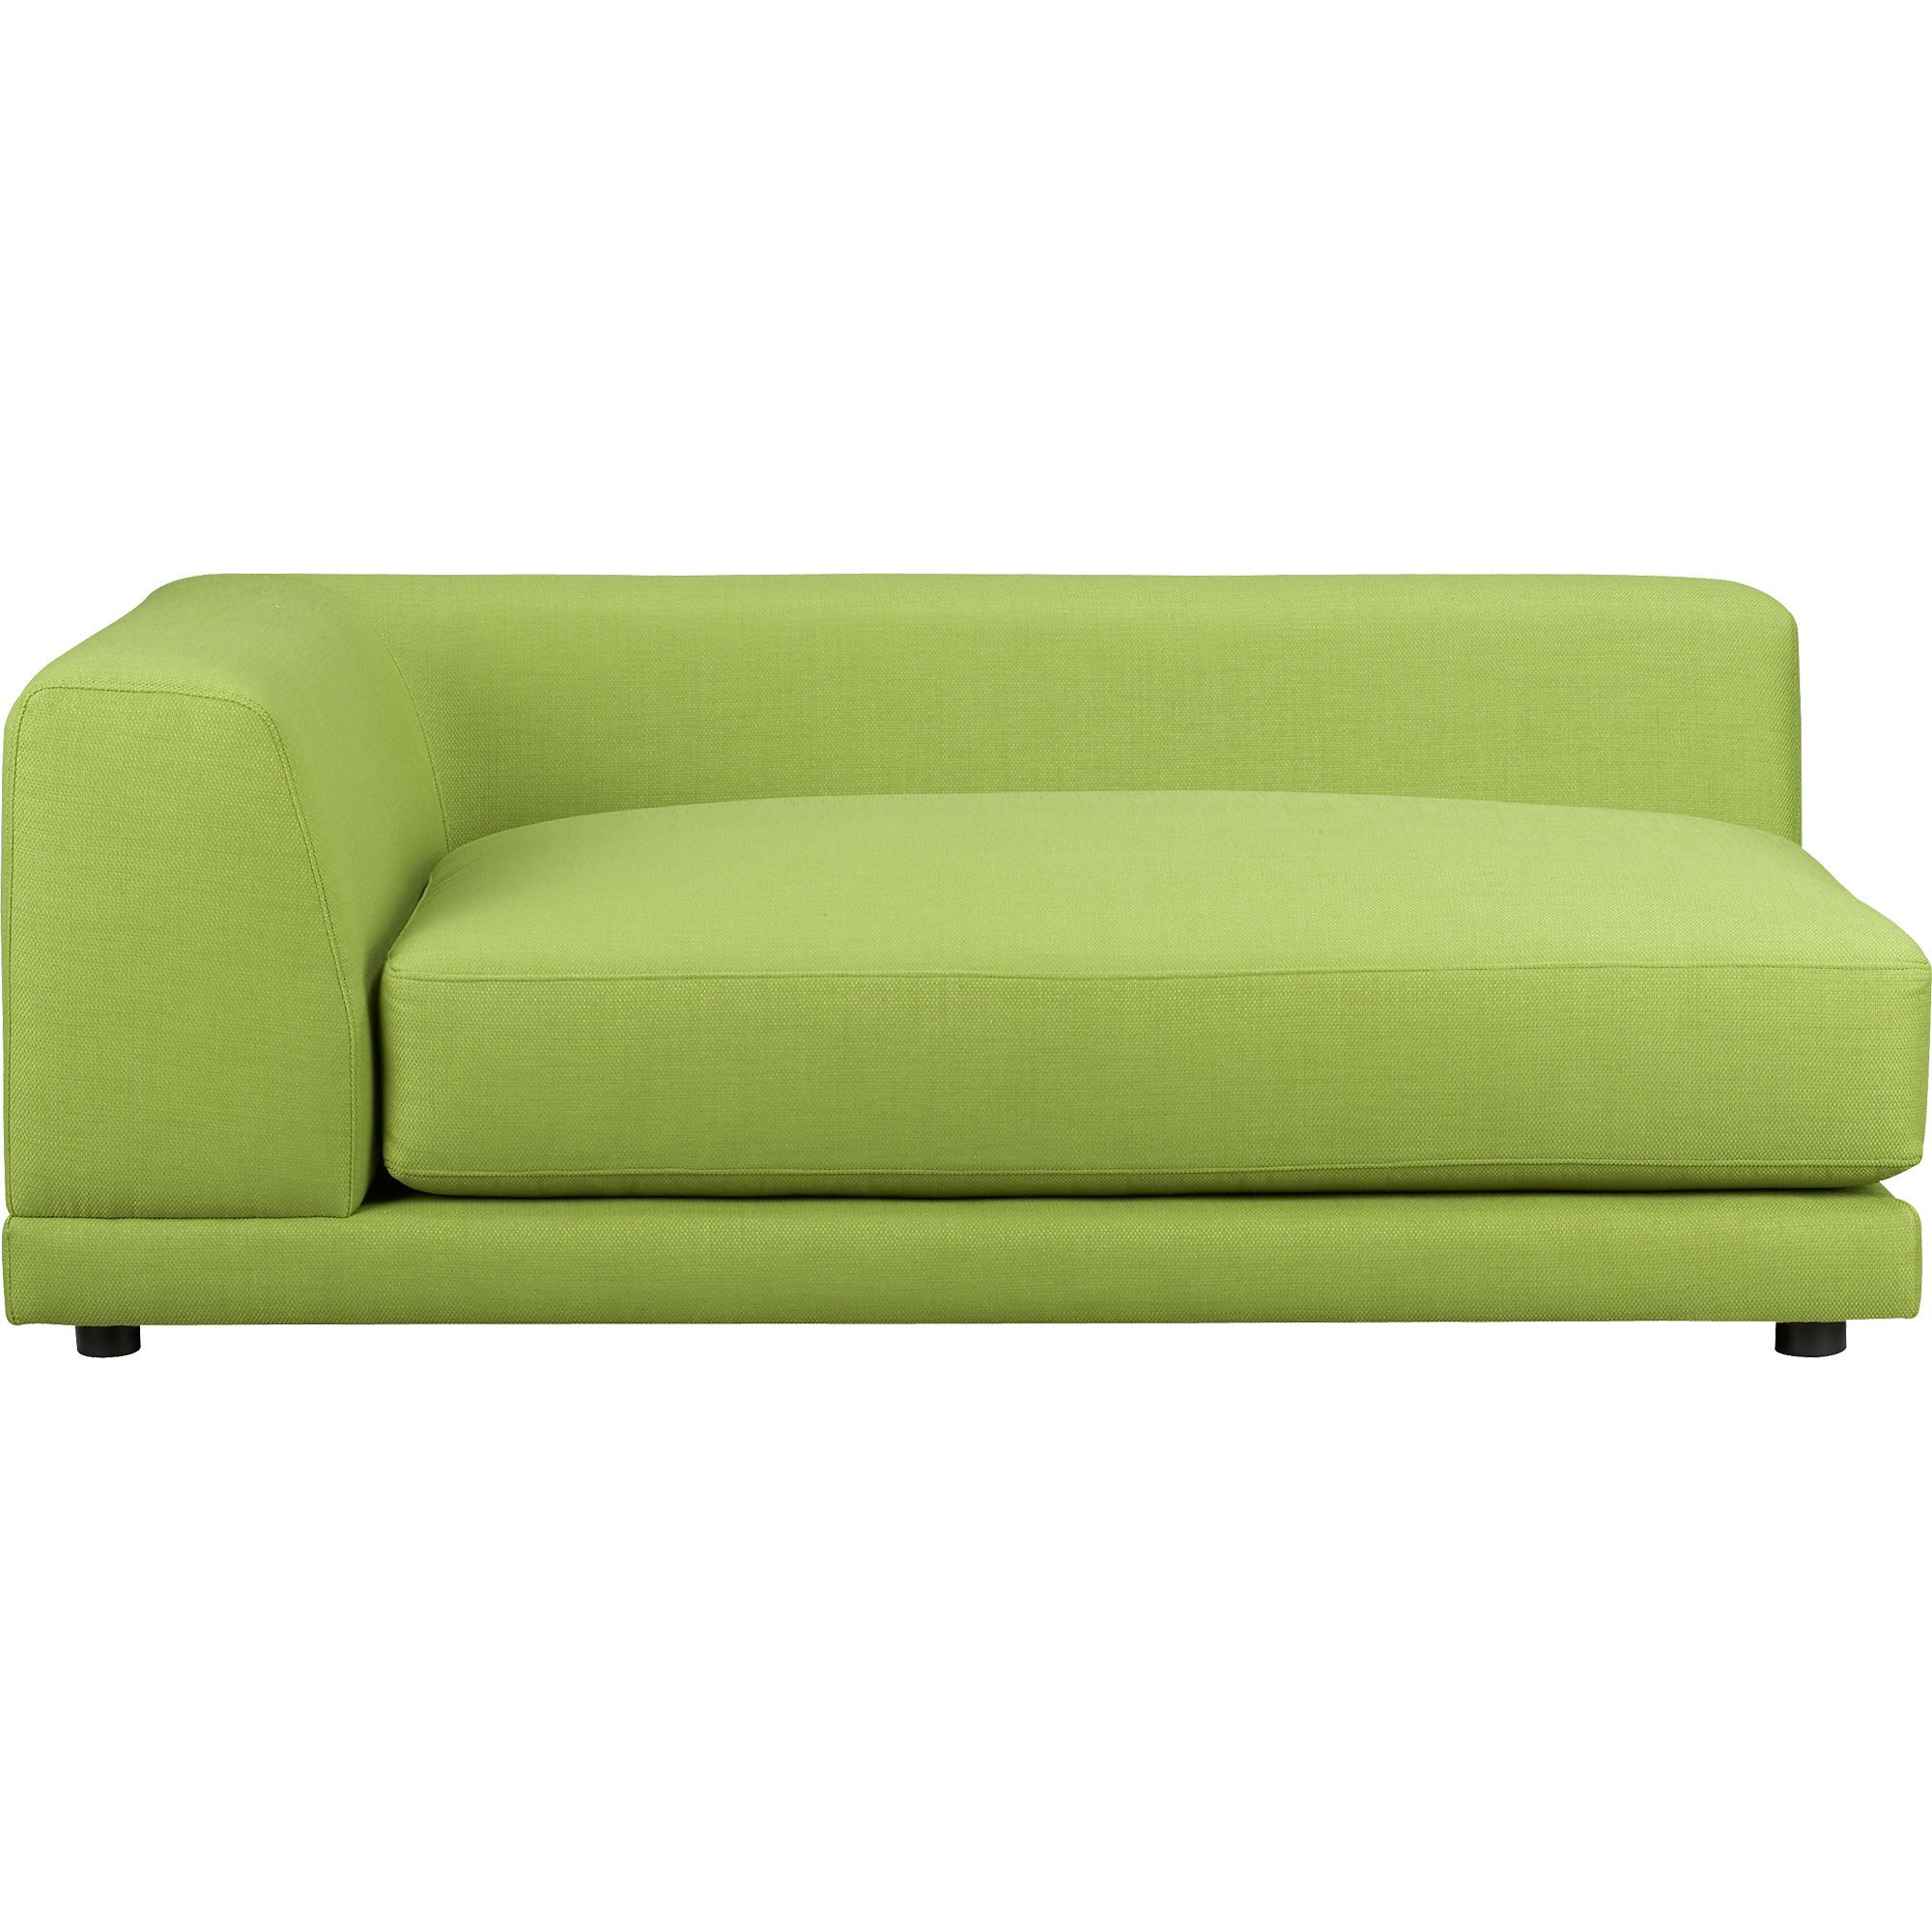 Uno Kiwi Left Arm Sofa One Super Easy